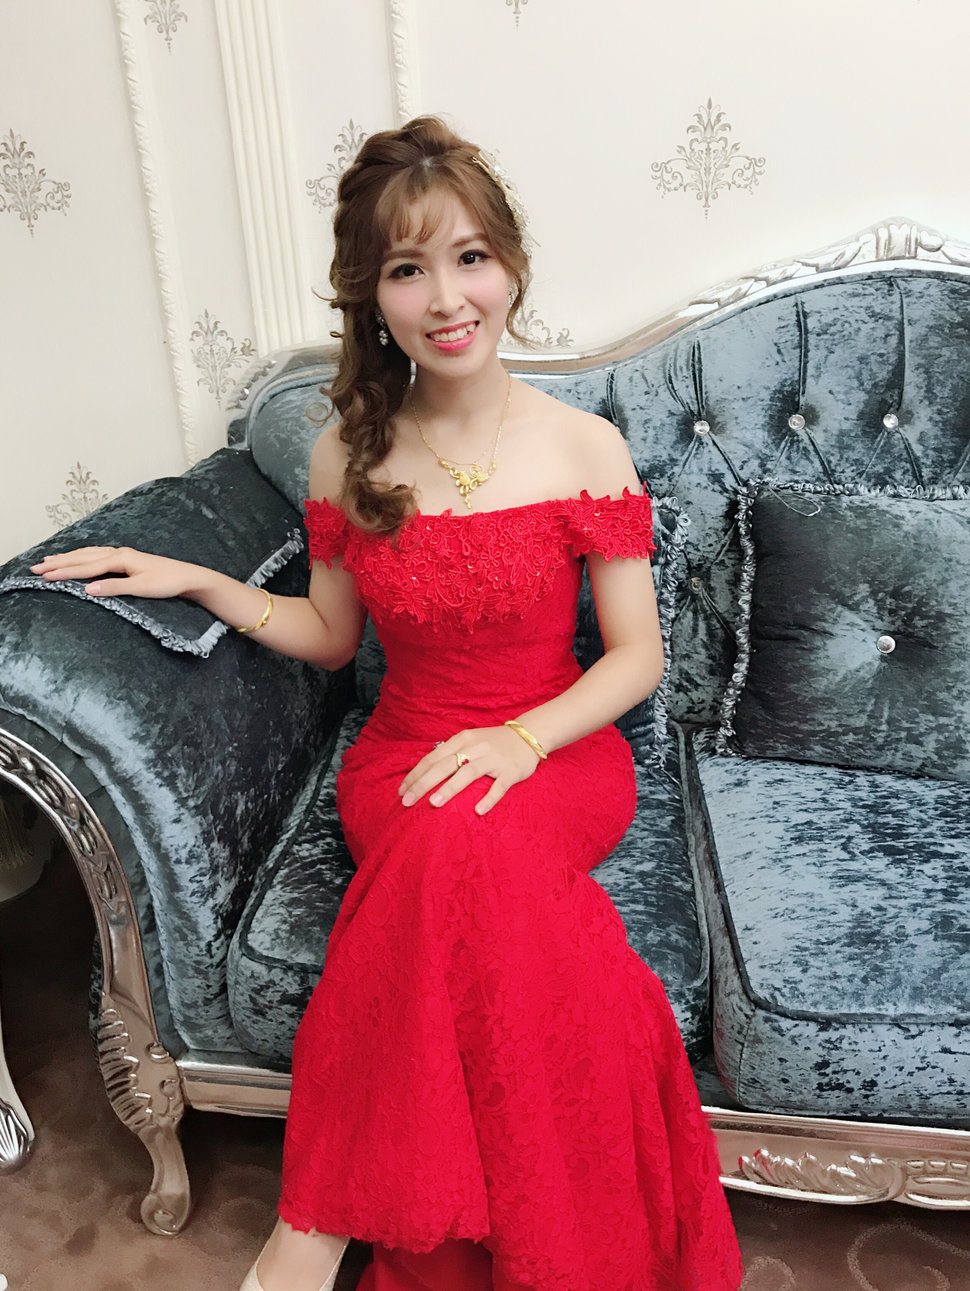 48C752EF-842D-45CB-8214-D9BB6AECA3FE - 台中高雄新娘秘書Ally Chen《結婚吧》